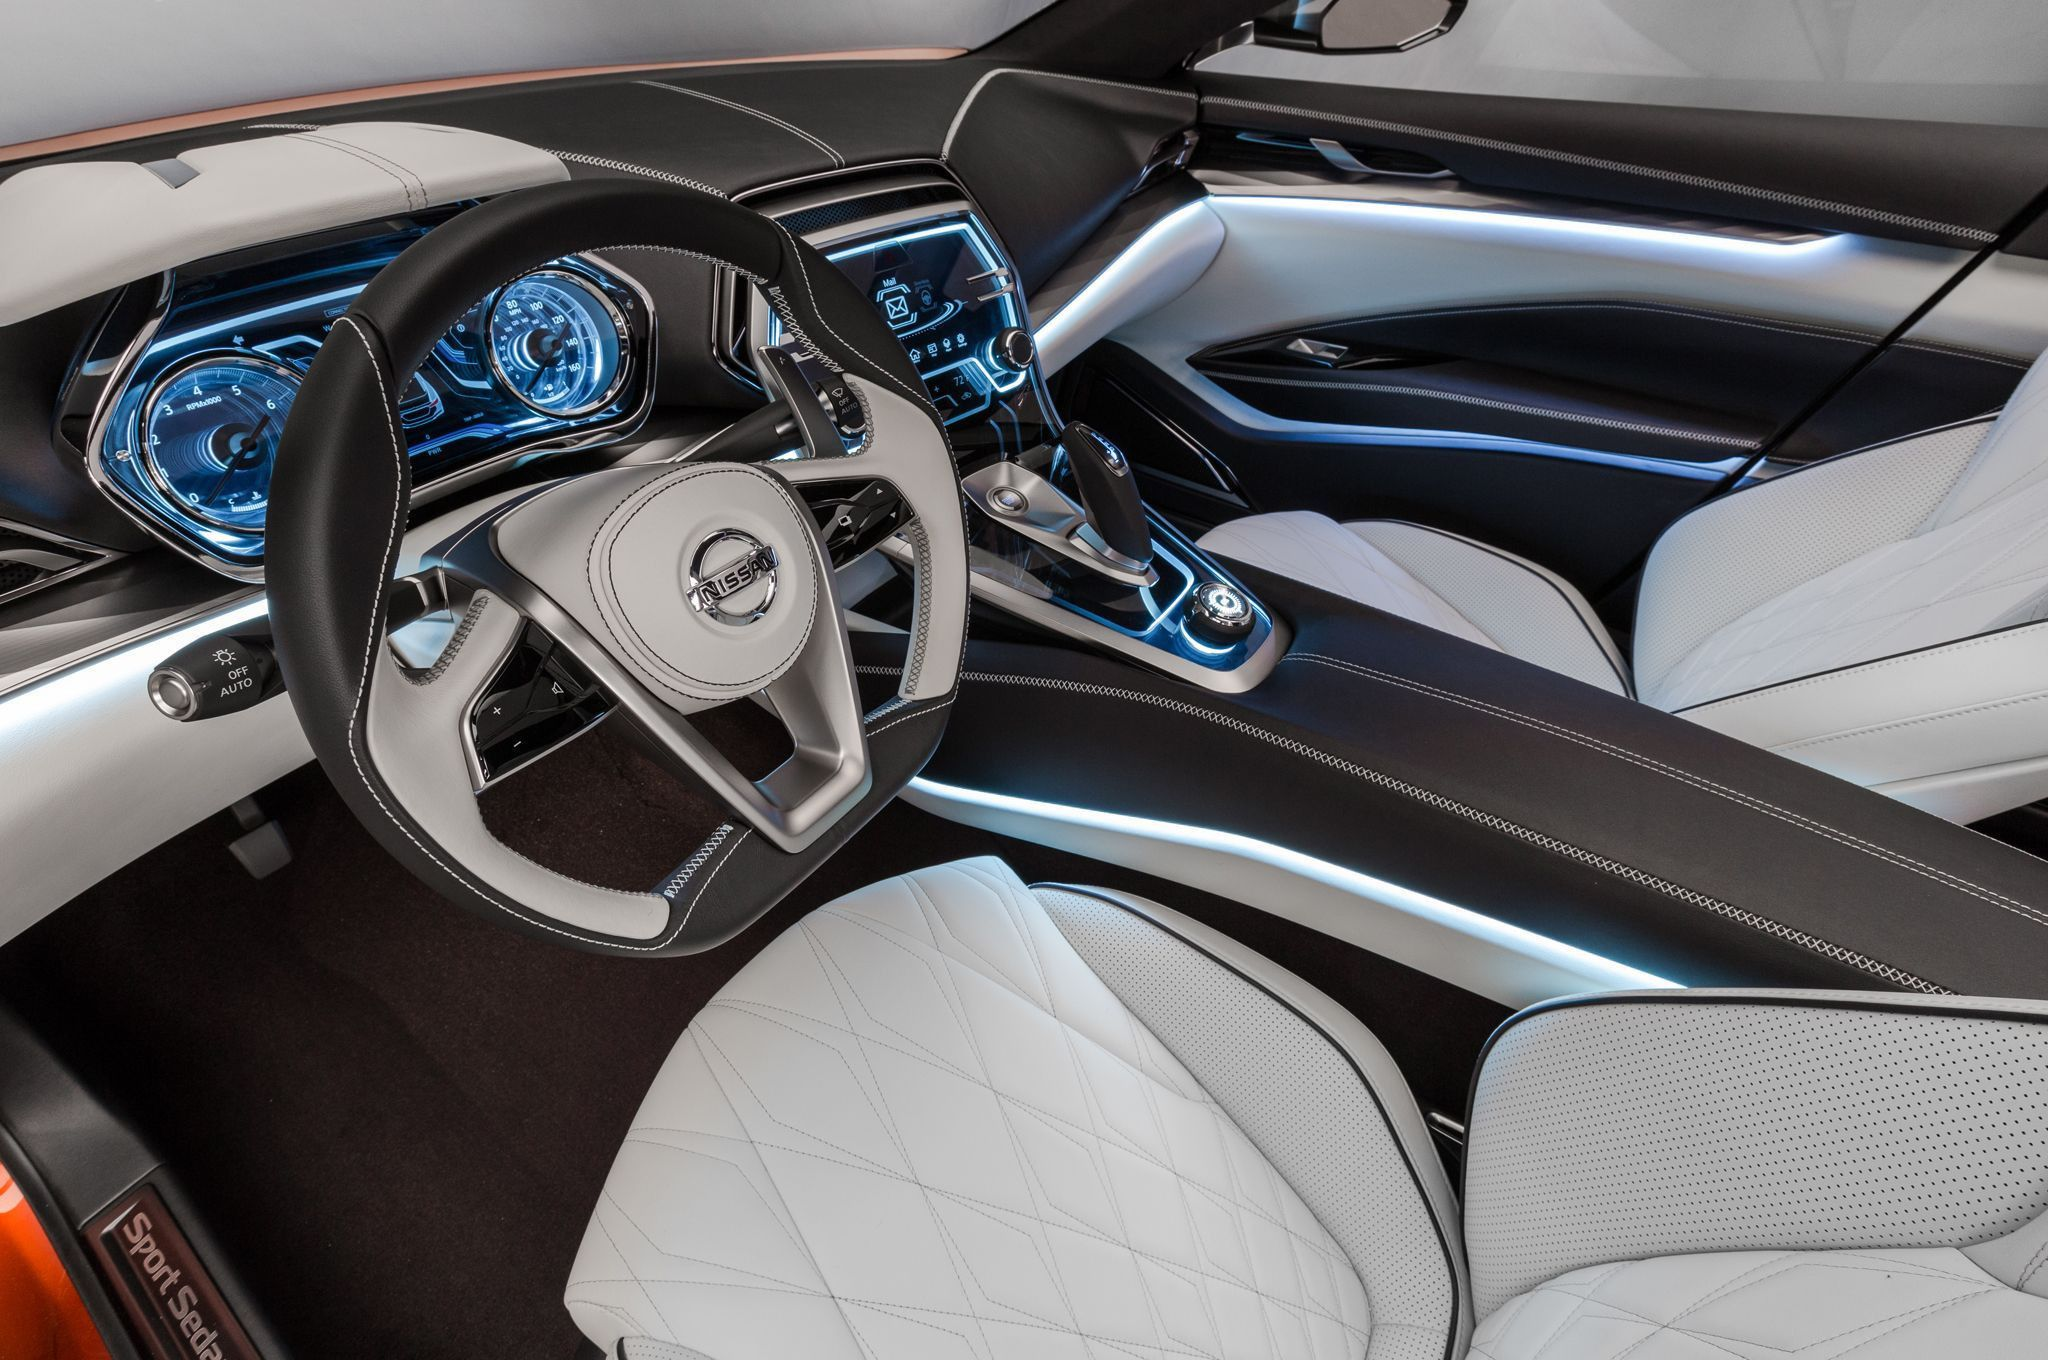 2020 Nissan Altima New 2020 Nissan Altima Specs 2020 Nissan